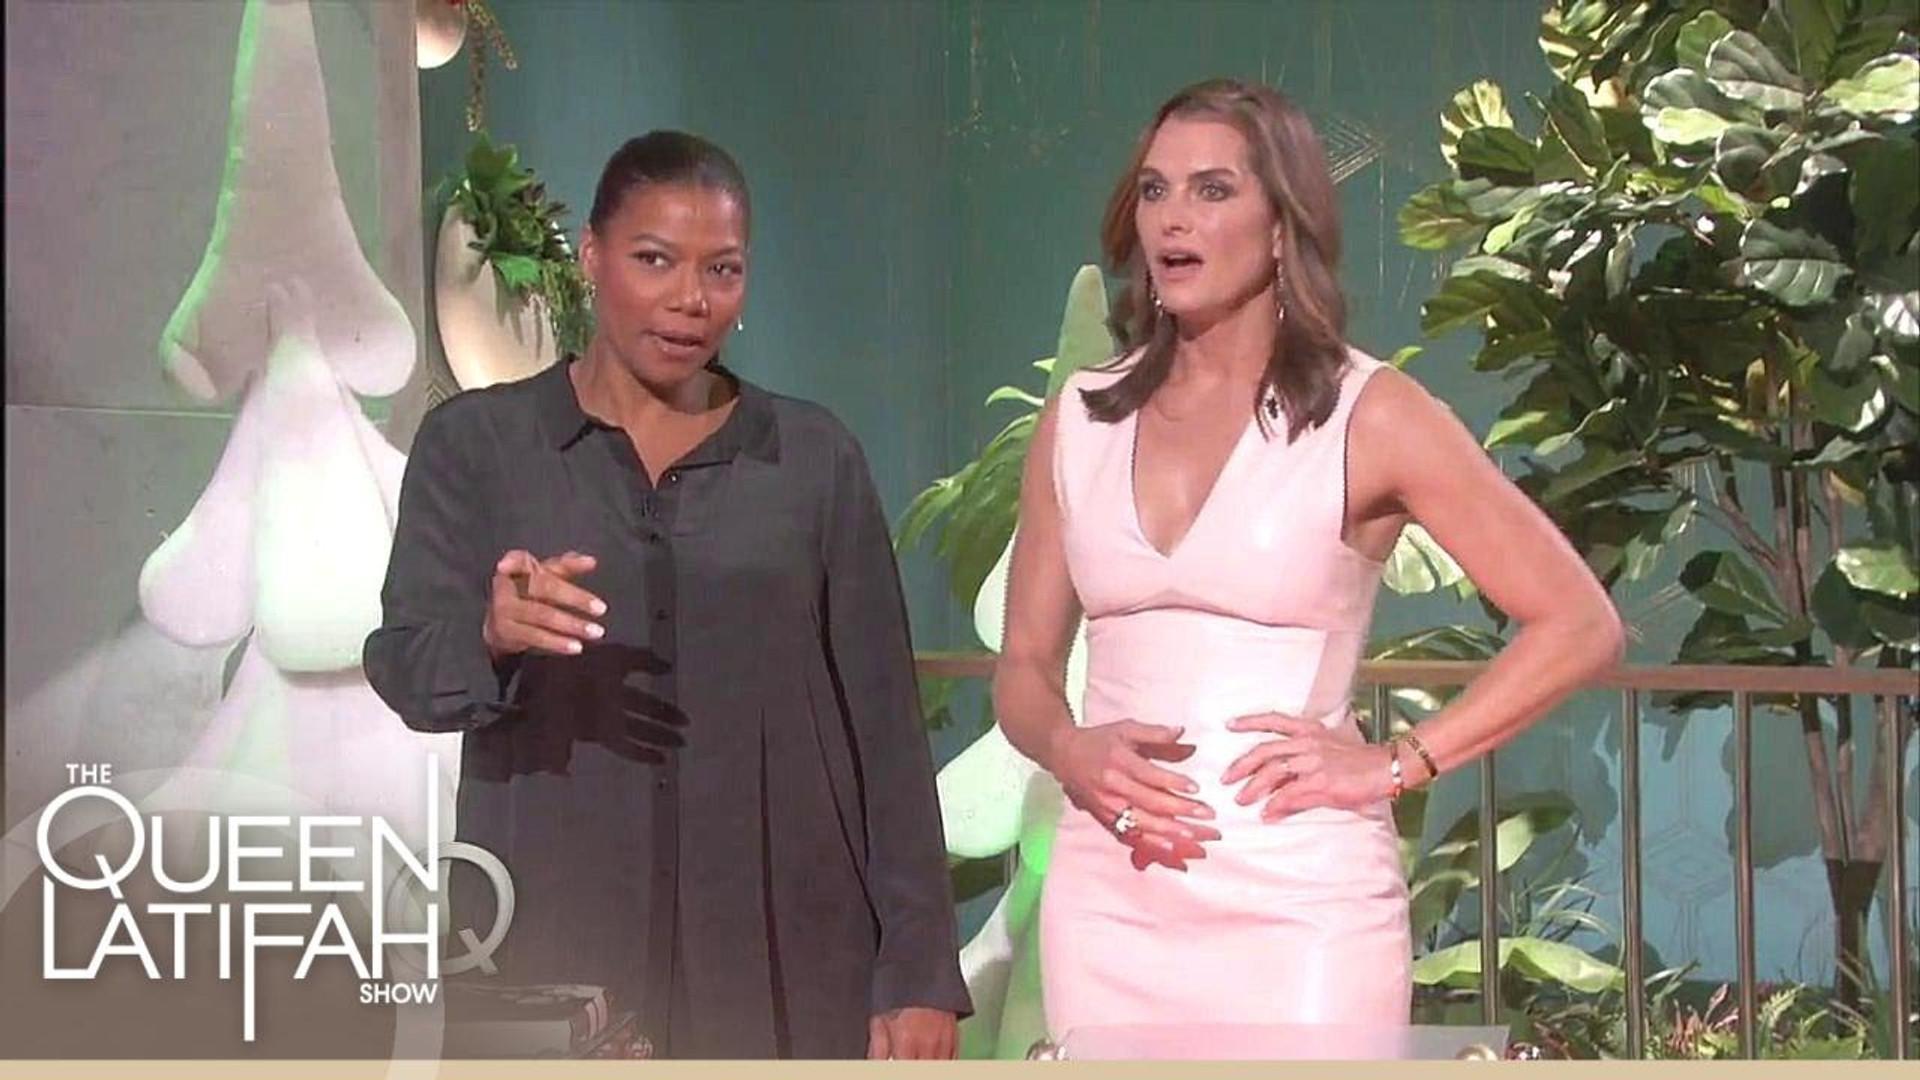 The Elf on The Queen Latifah Show   2014